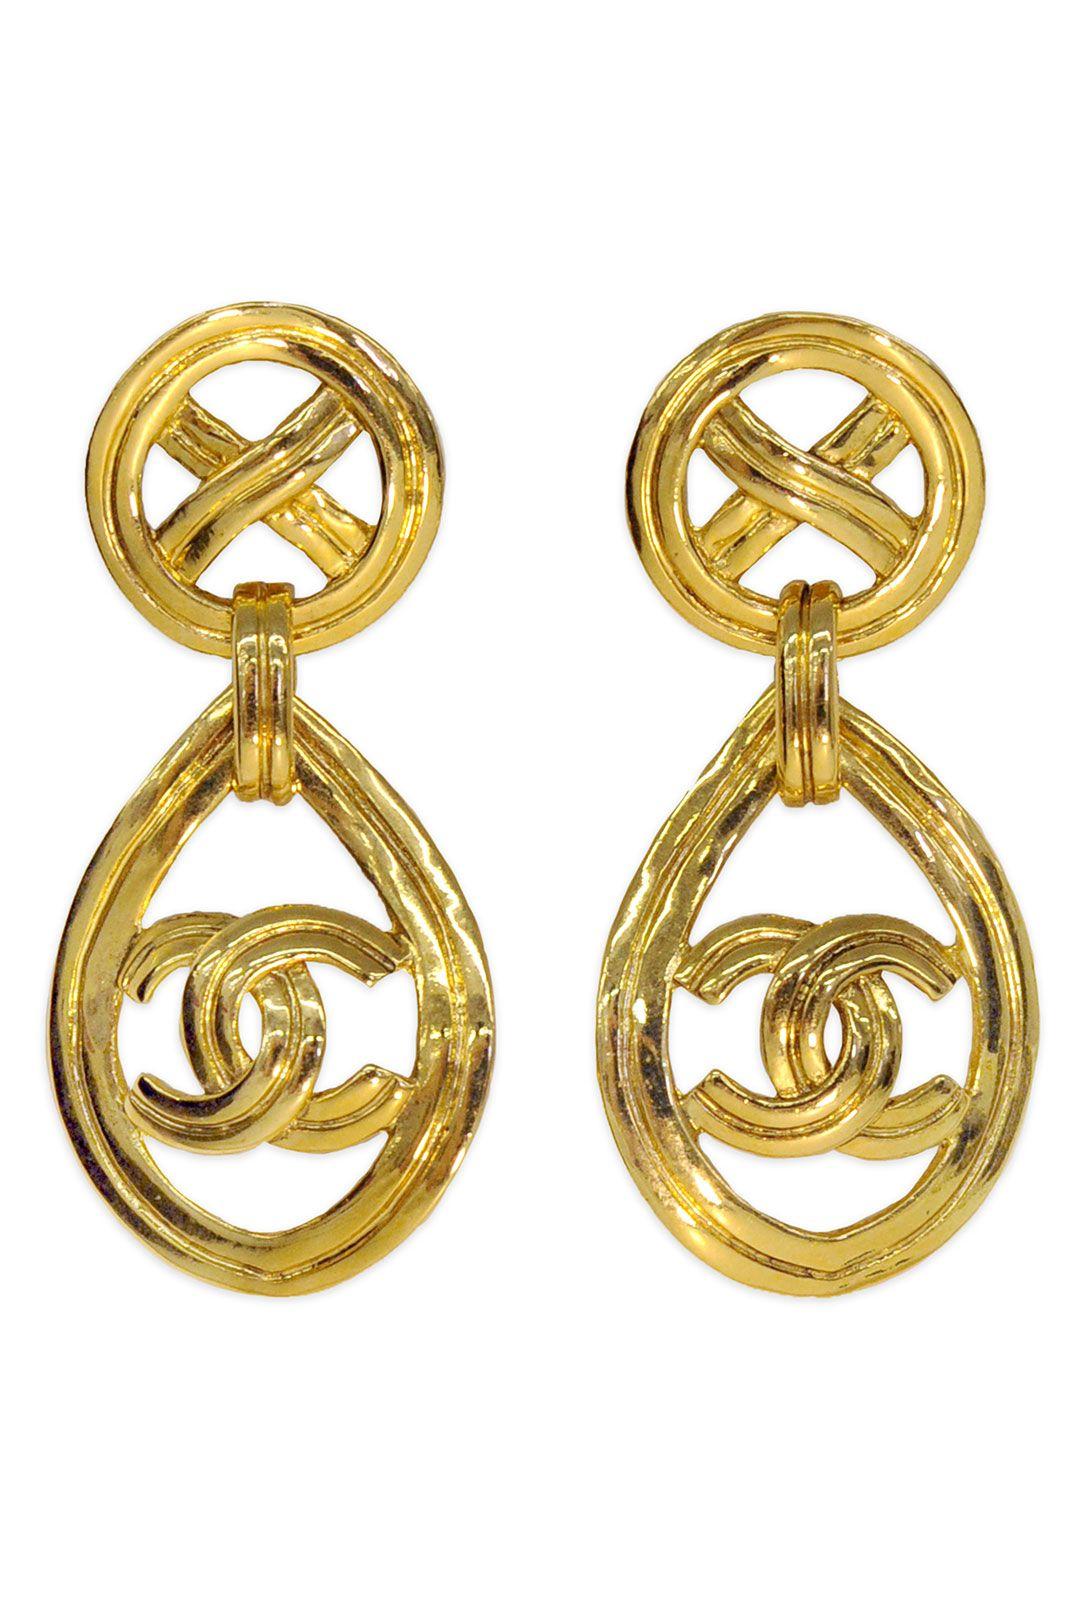 Vintage Chanel CC Gold Drop Earrings Vintage chanel